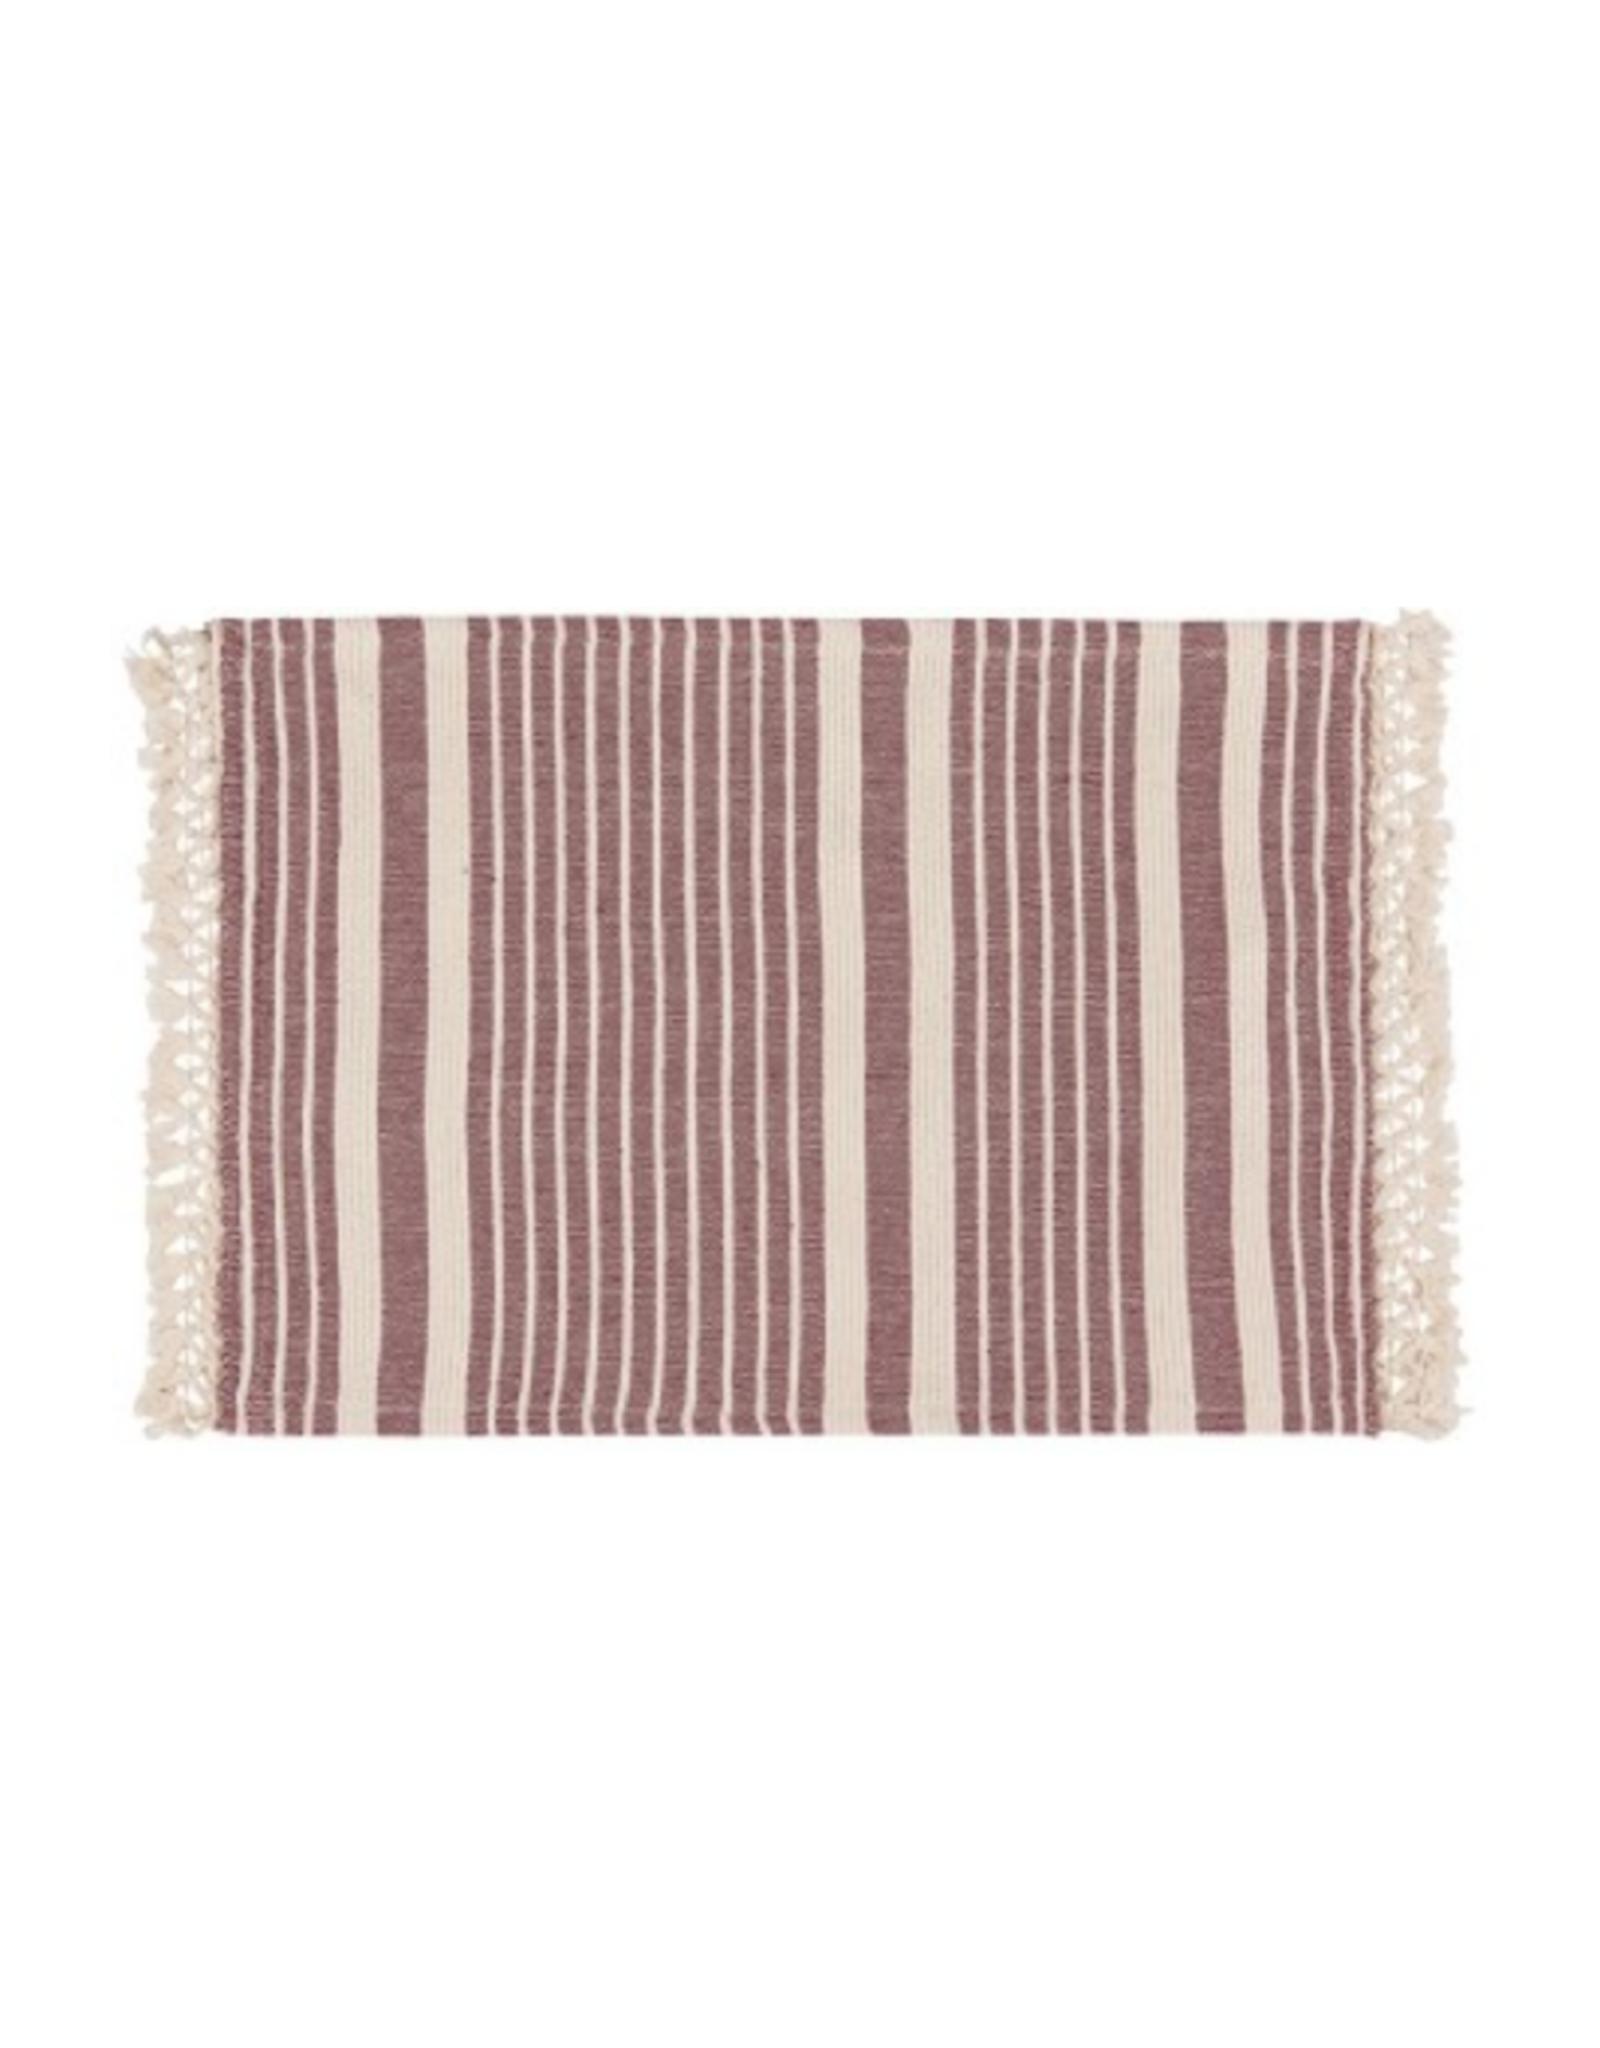 DCA - Placemat/Stripe, Vino